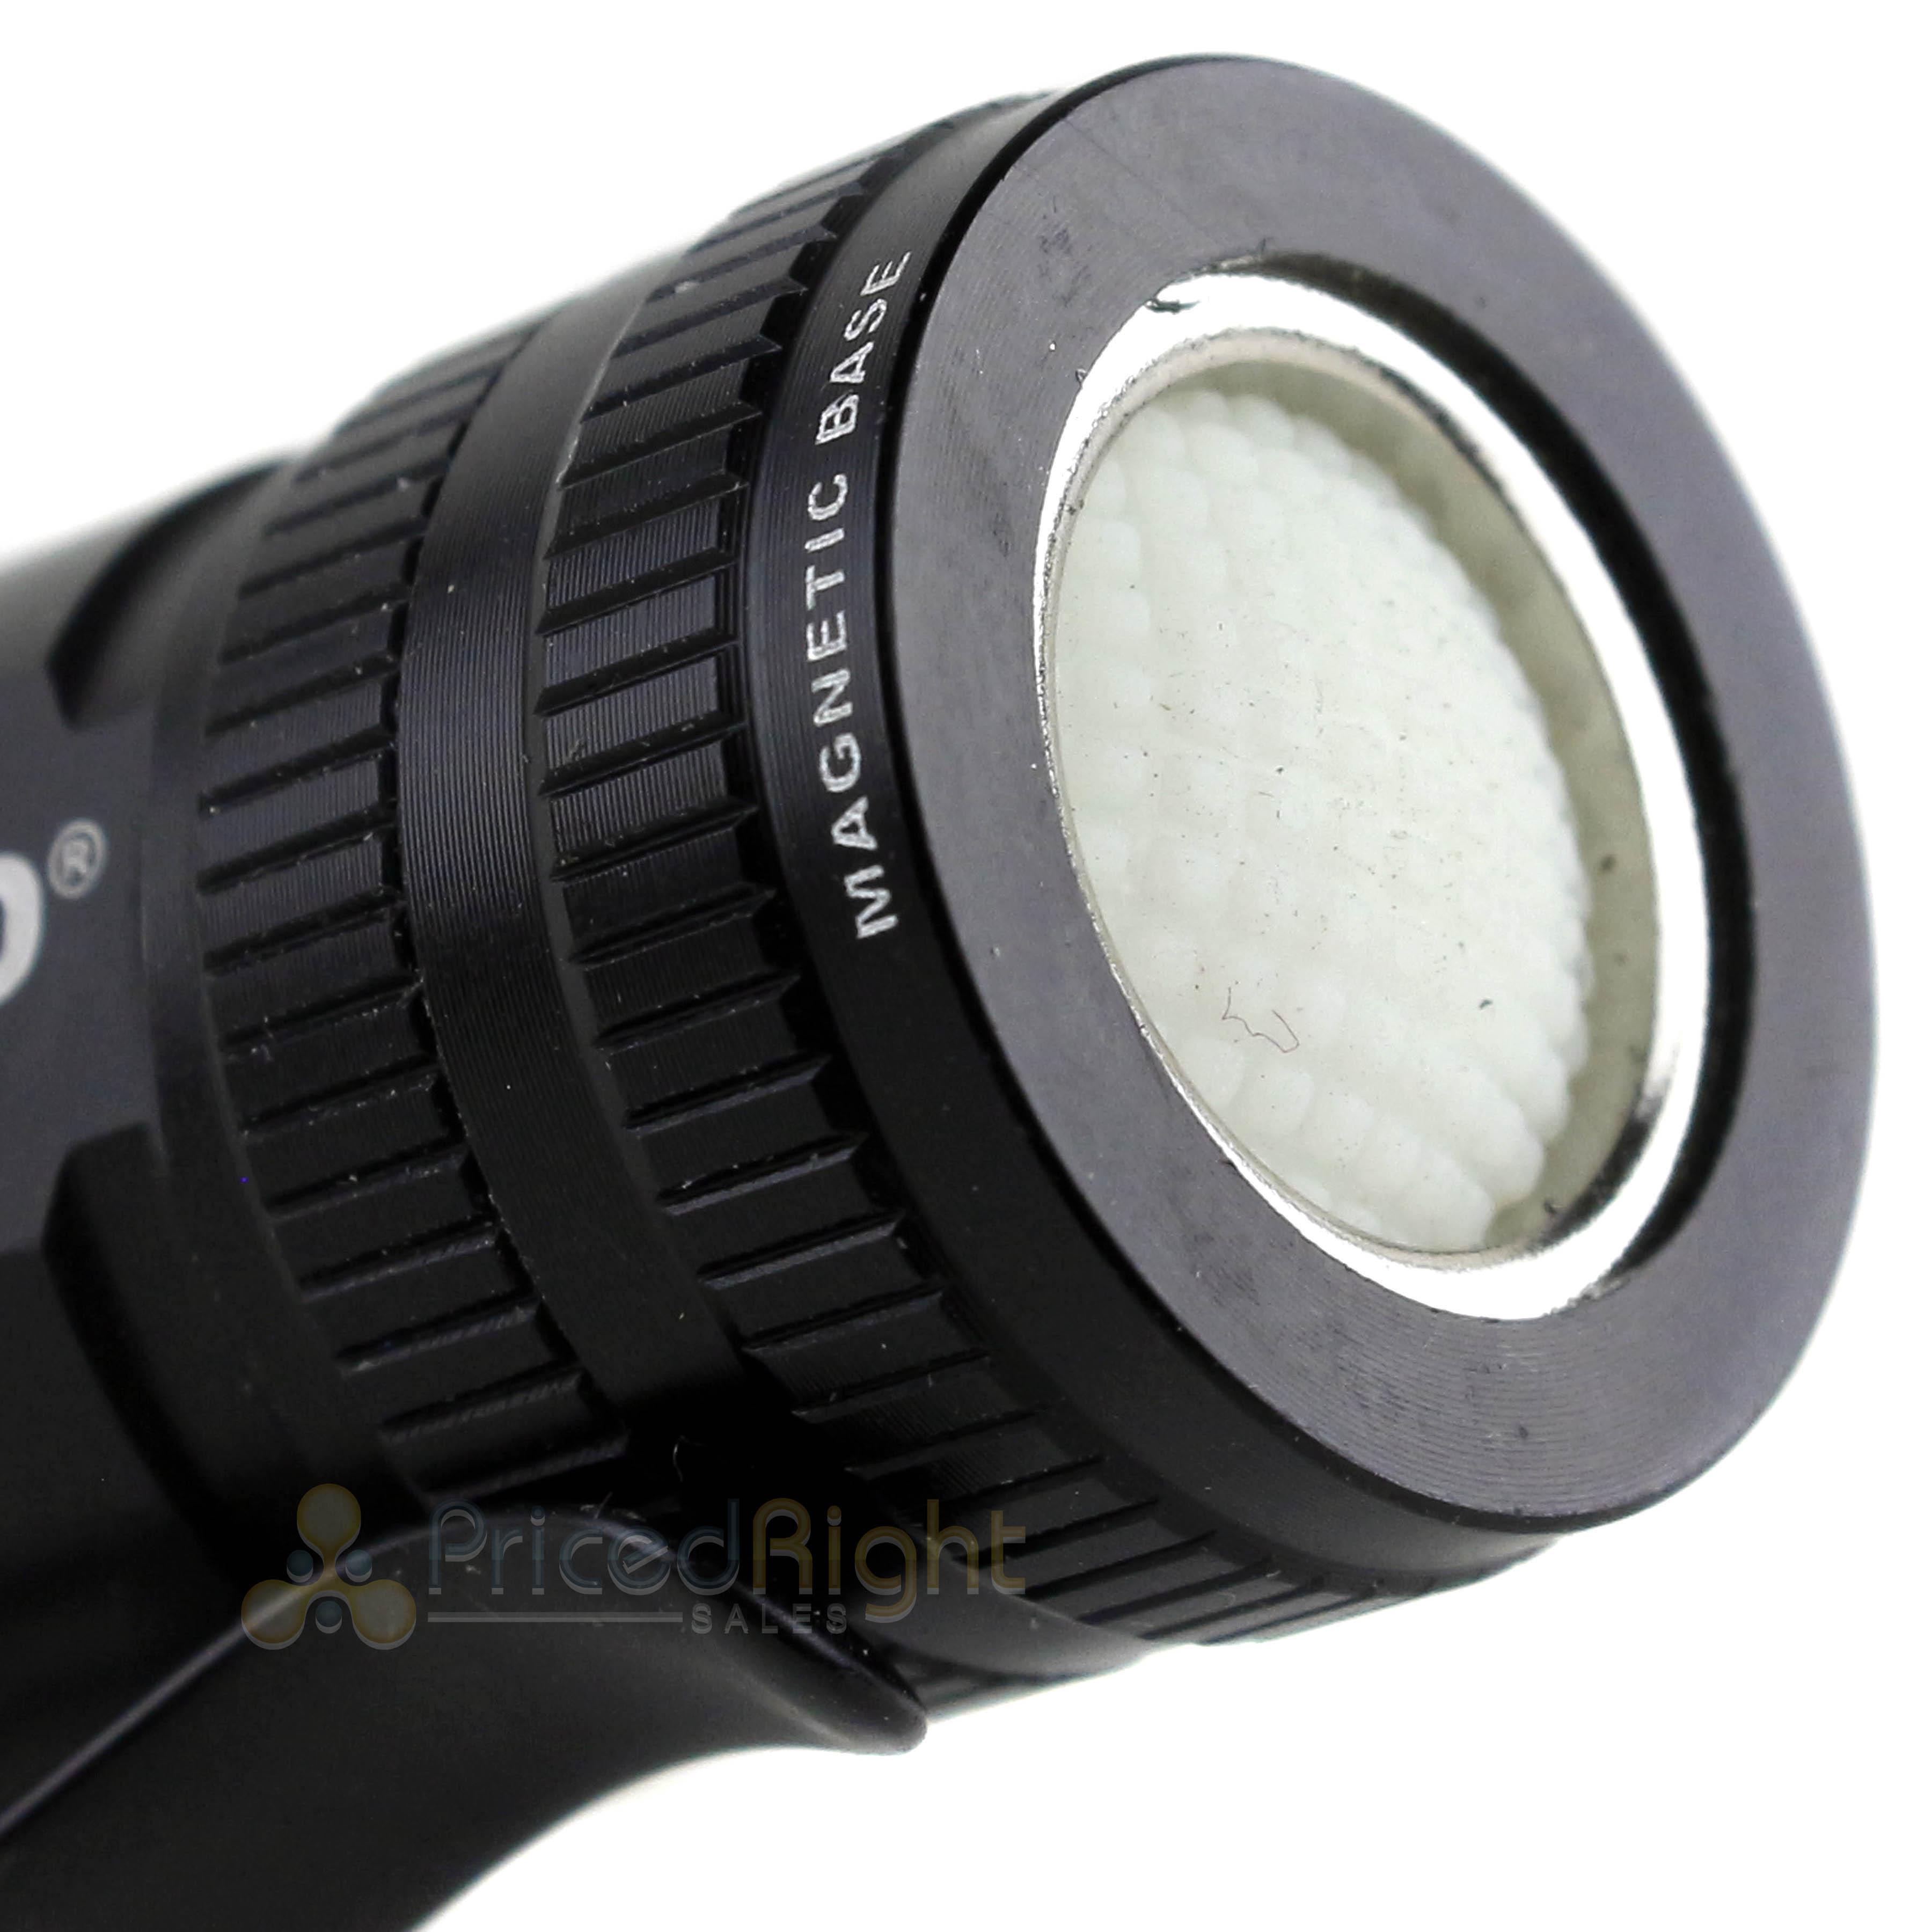 NEBO 6272 Micro Redline OC 360 lux pocket handheld flashlight 6x zoom clip